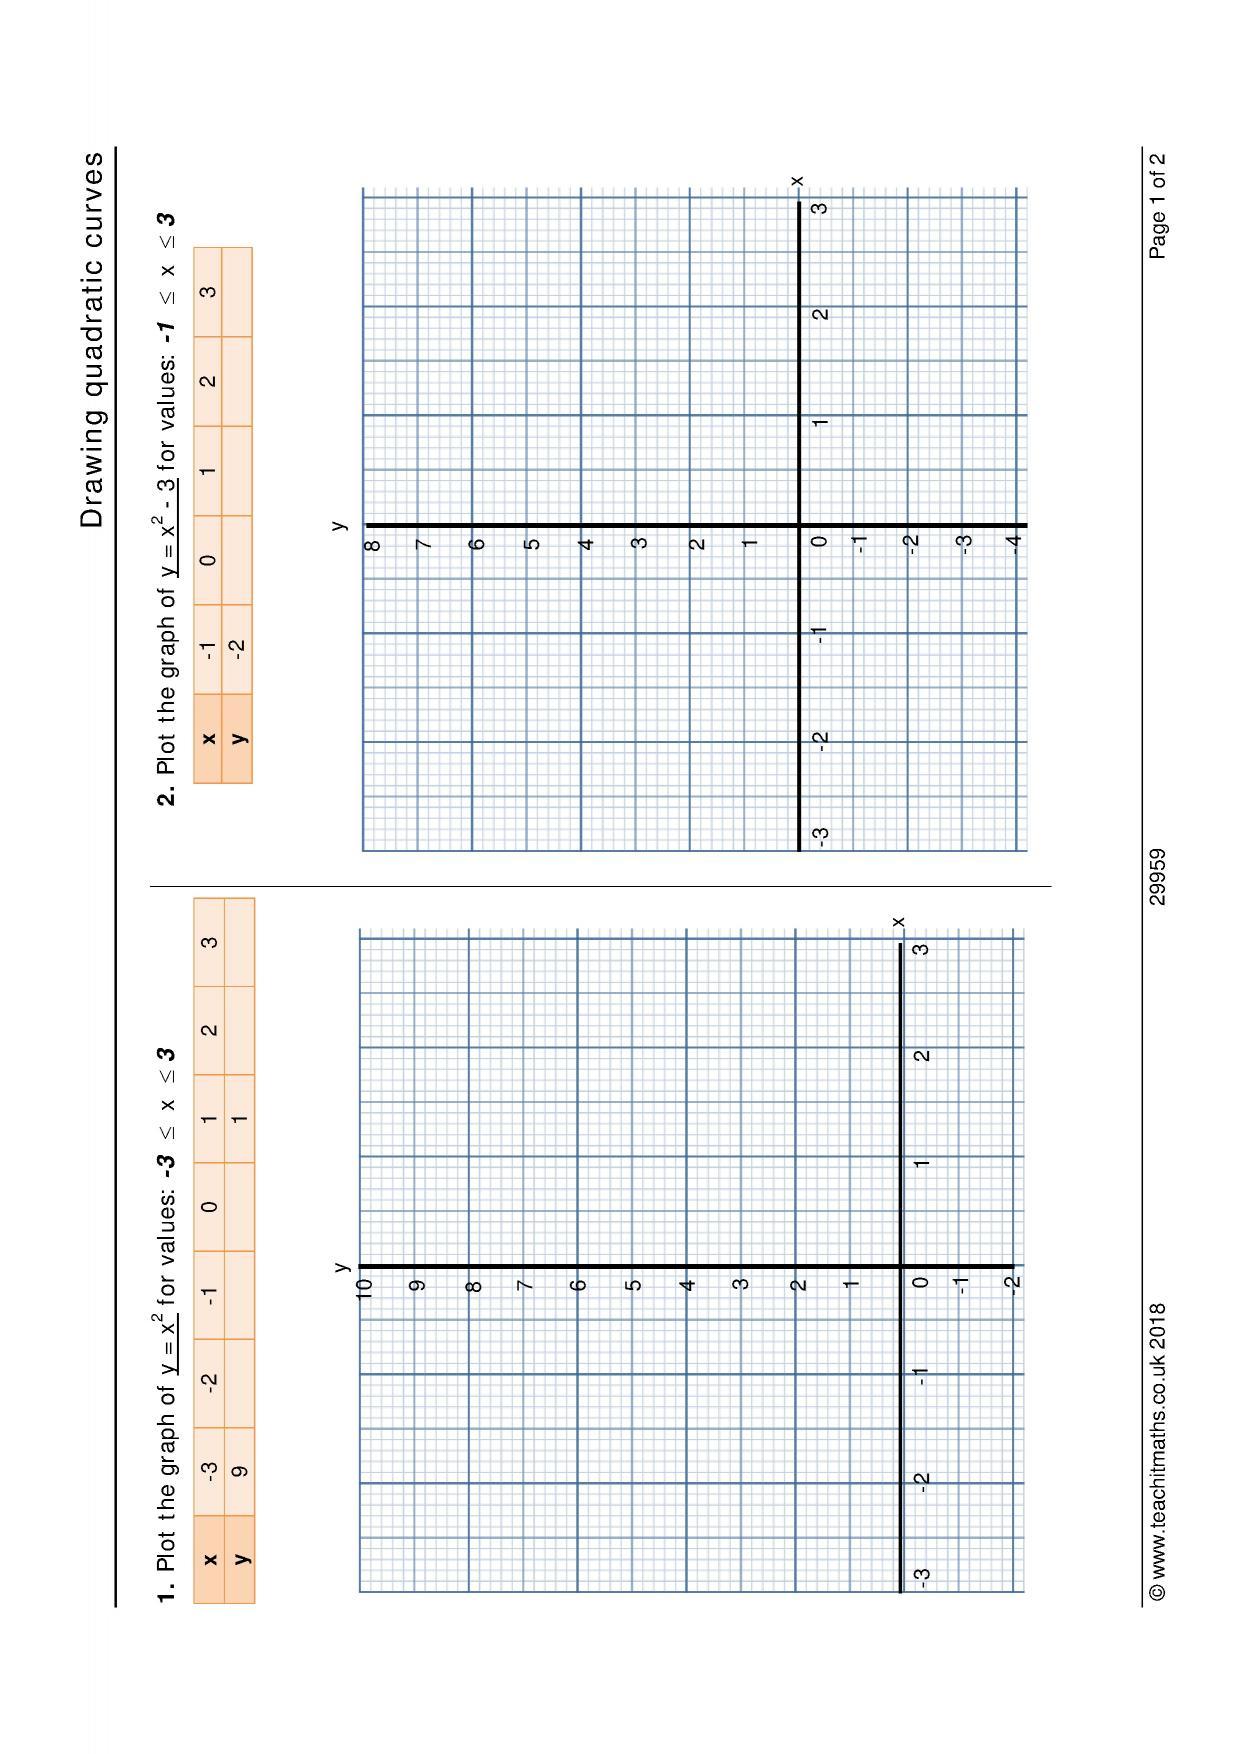 Matching Quadratic Equations To Graphs Worksheet